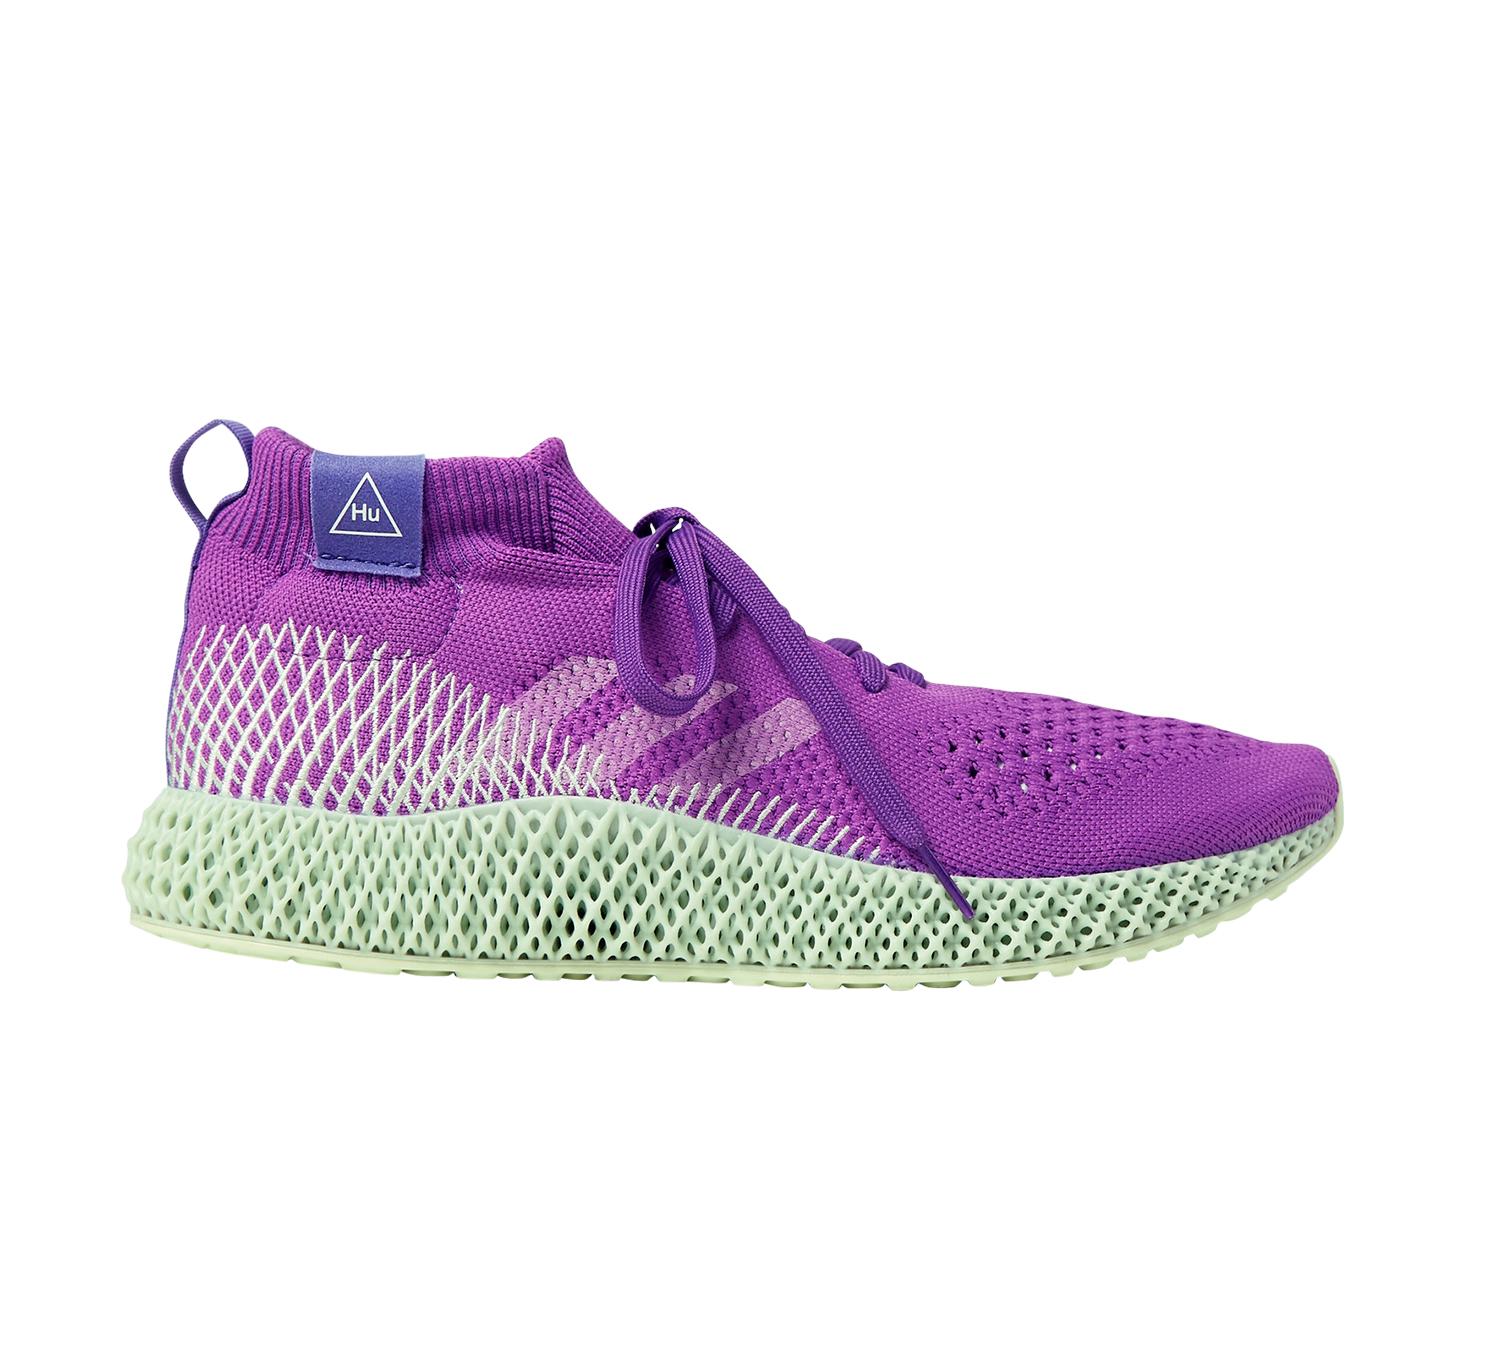 sneakers06_revistamine_interior